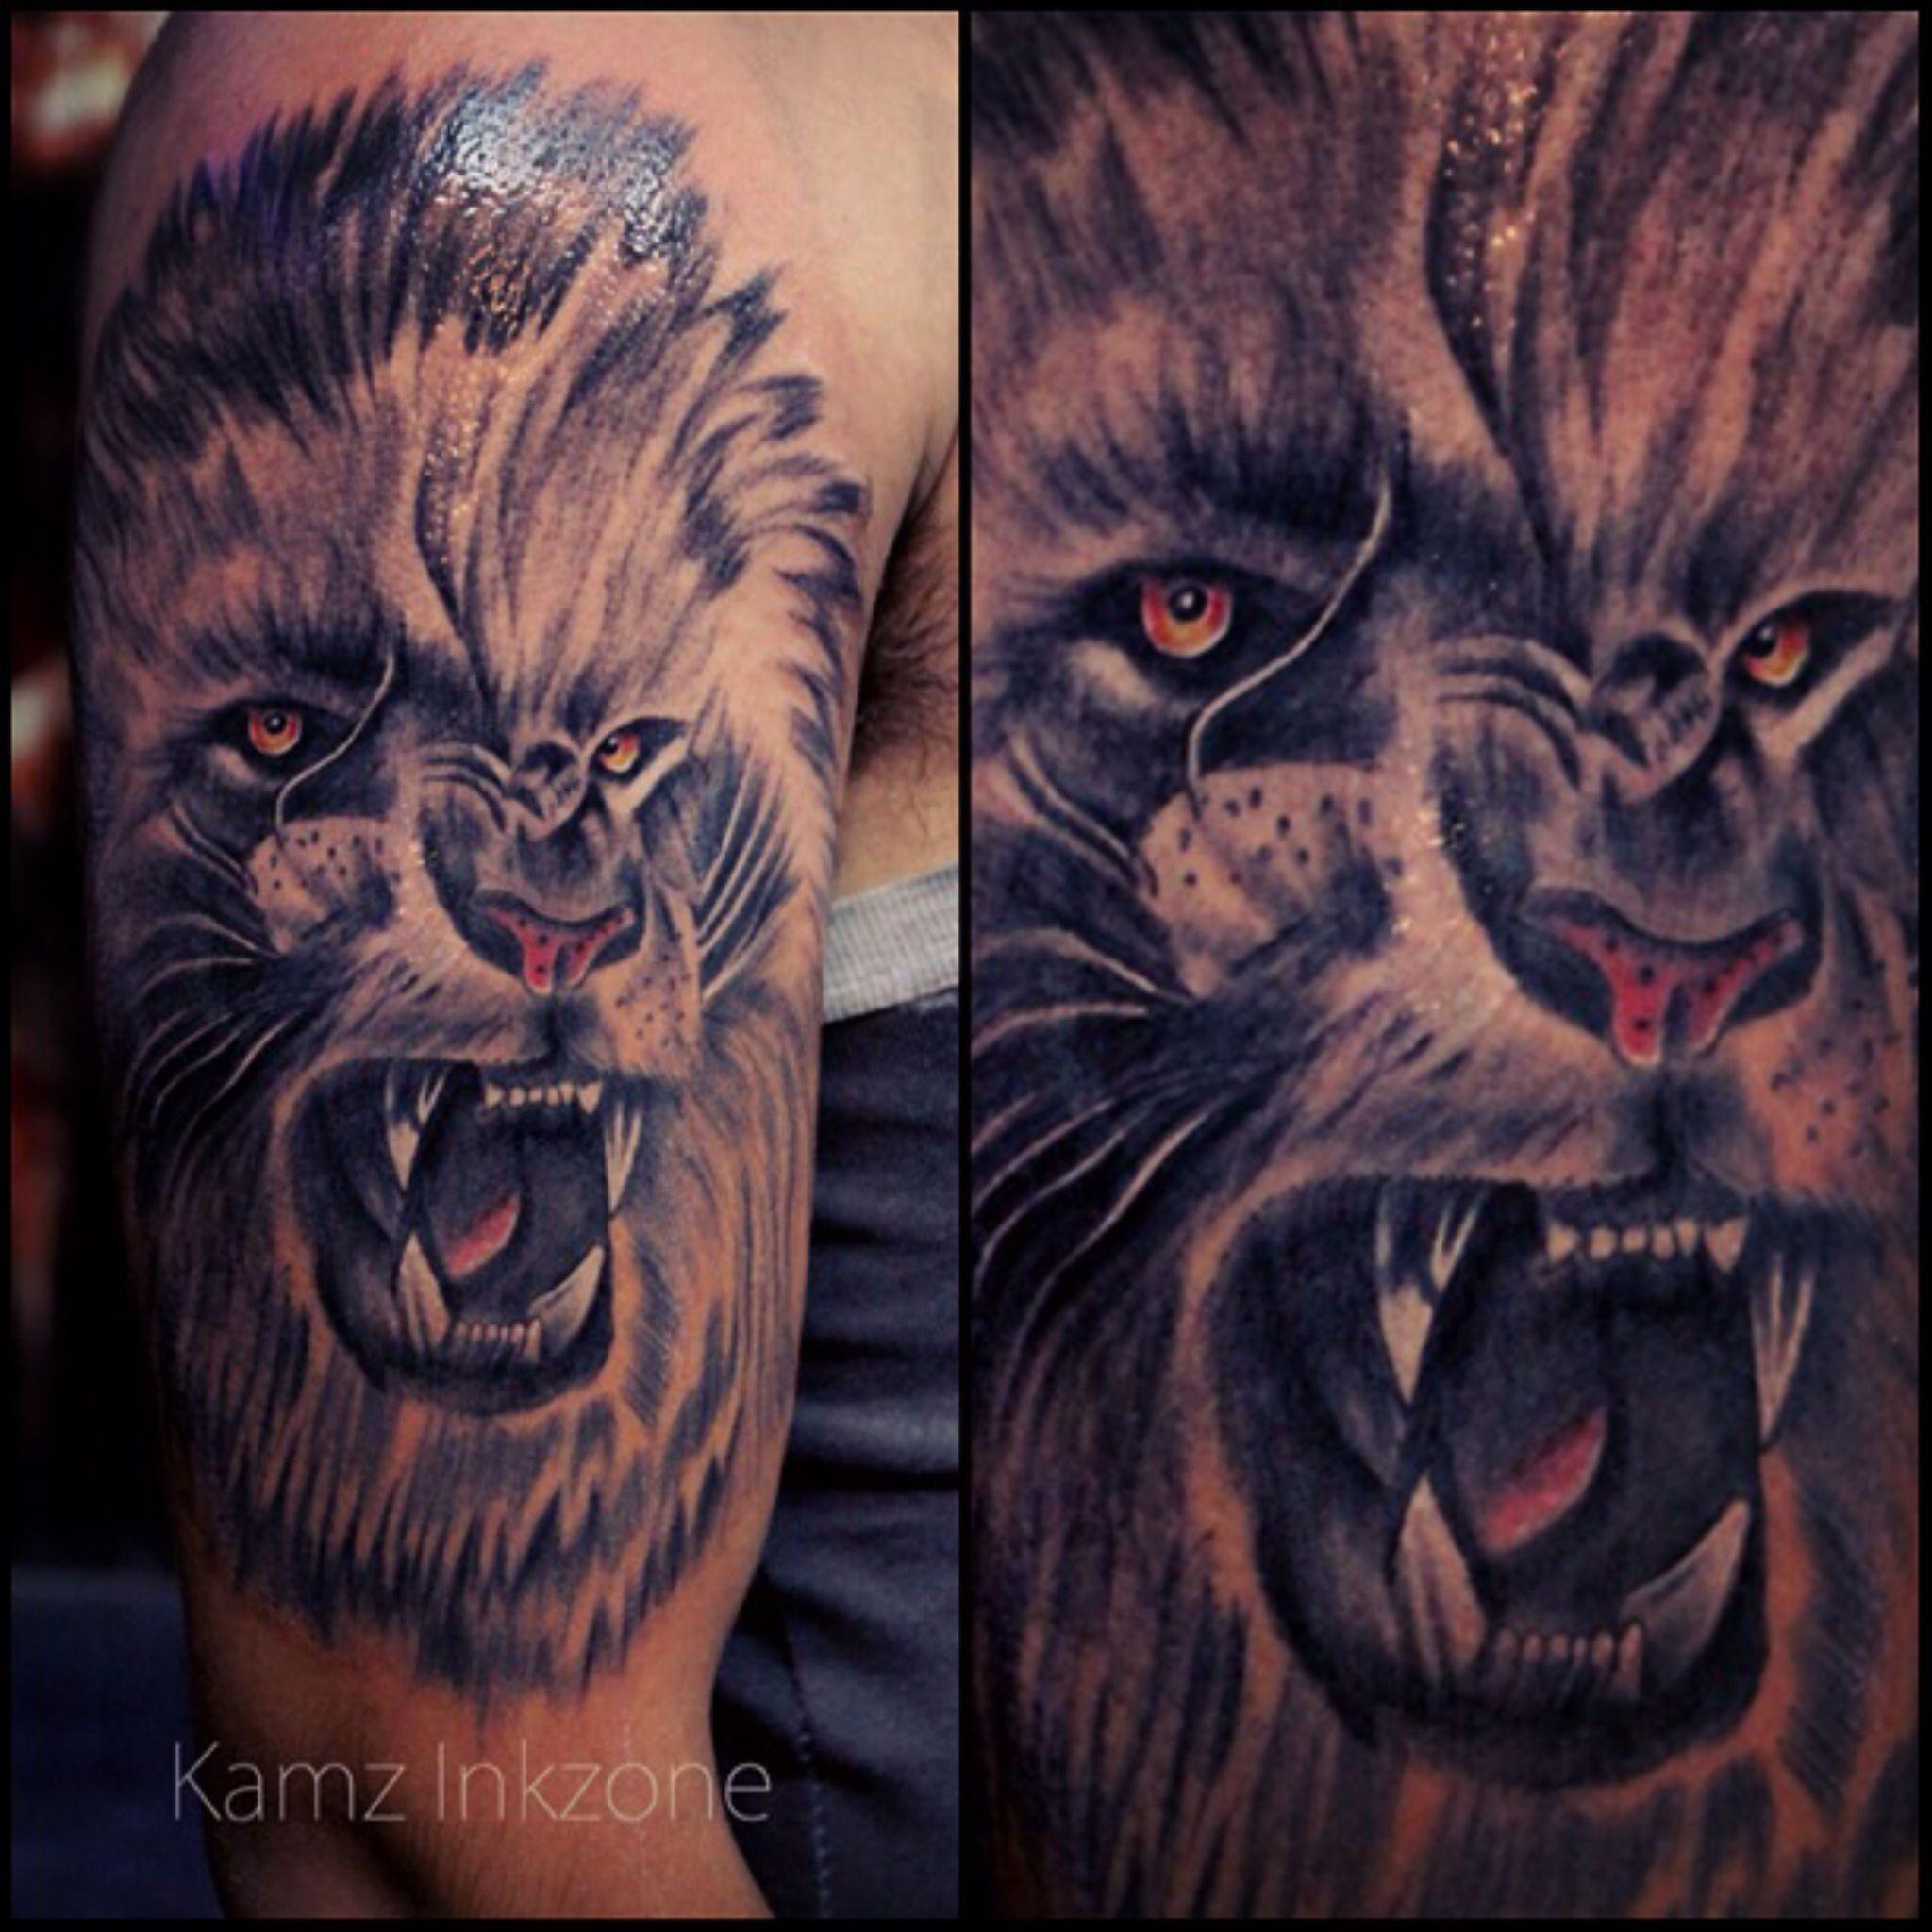 kamzinkzone tattoos  by kamz.inkzone